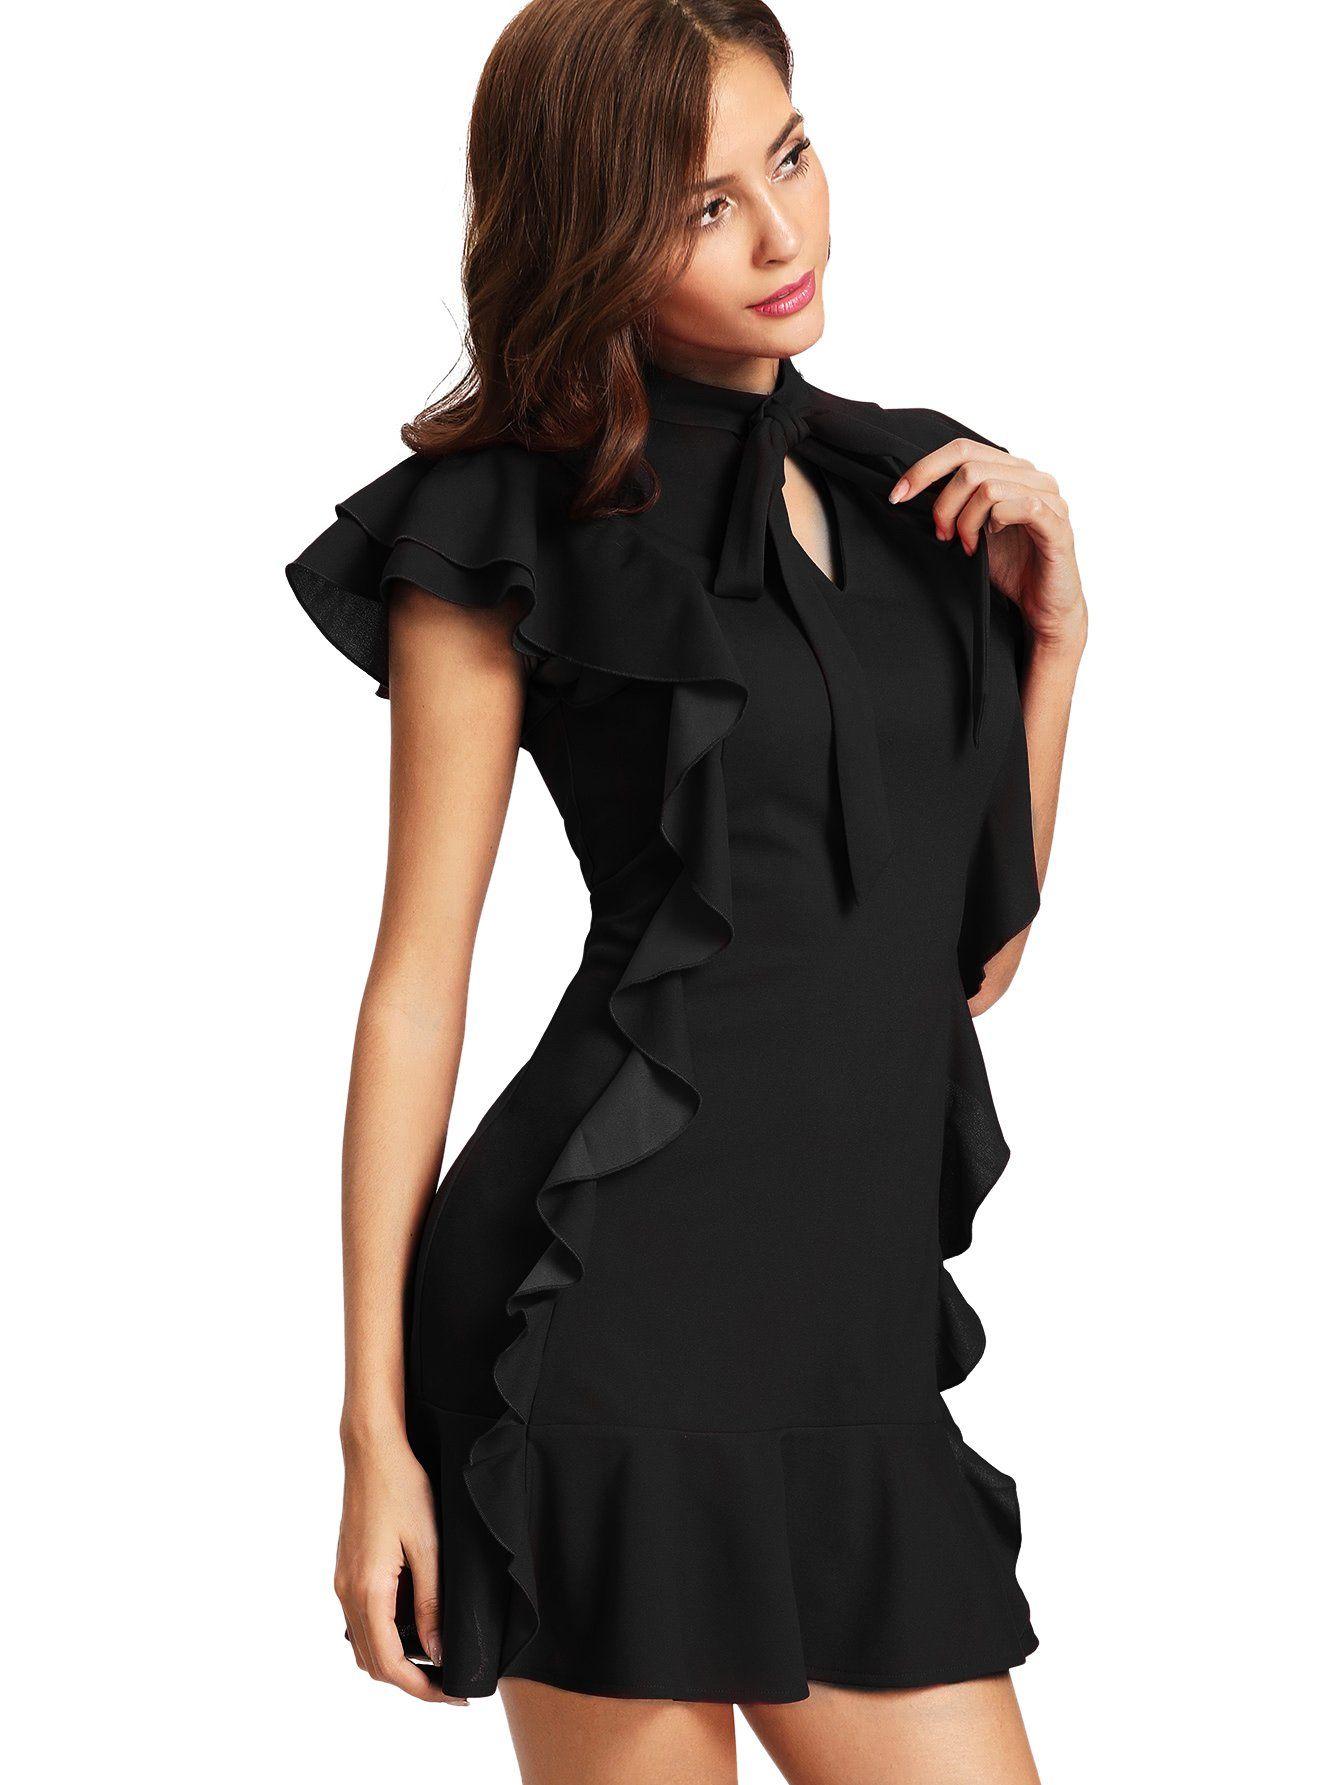 a4e144580e4 Floerns Womens Tie Neck Ruffle Hem Short Cocktail Party Dress Black XS >>>  Want